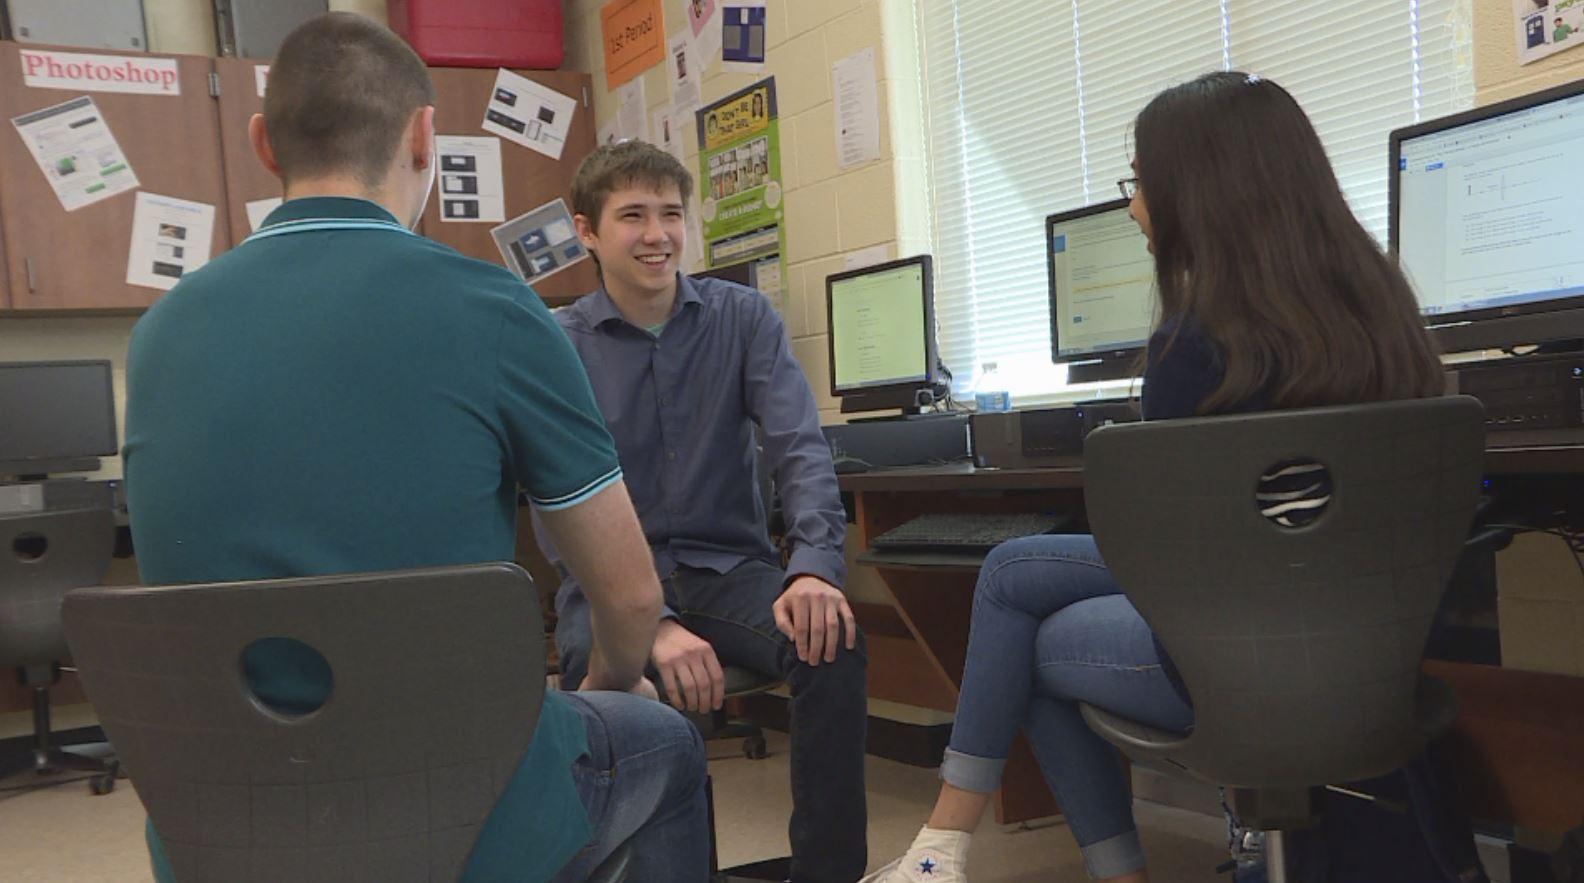 Zachary Handshoe talking with classmates (KXAN photo)_466044